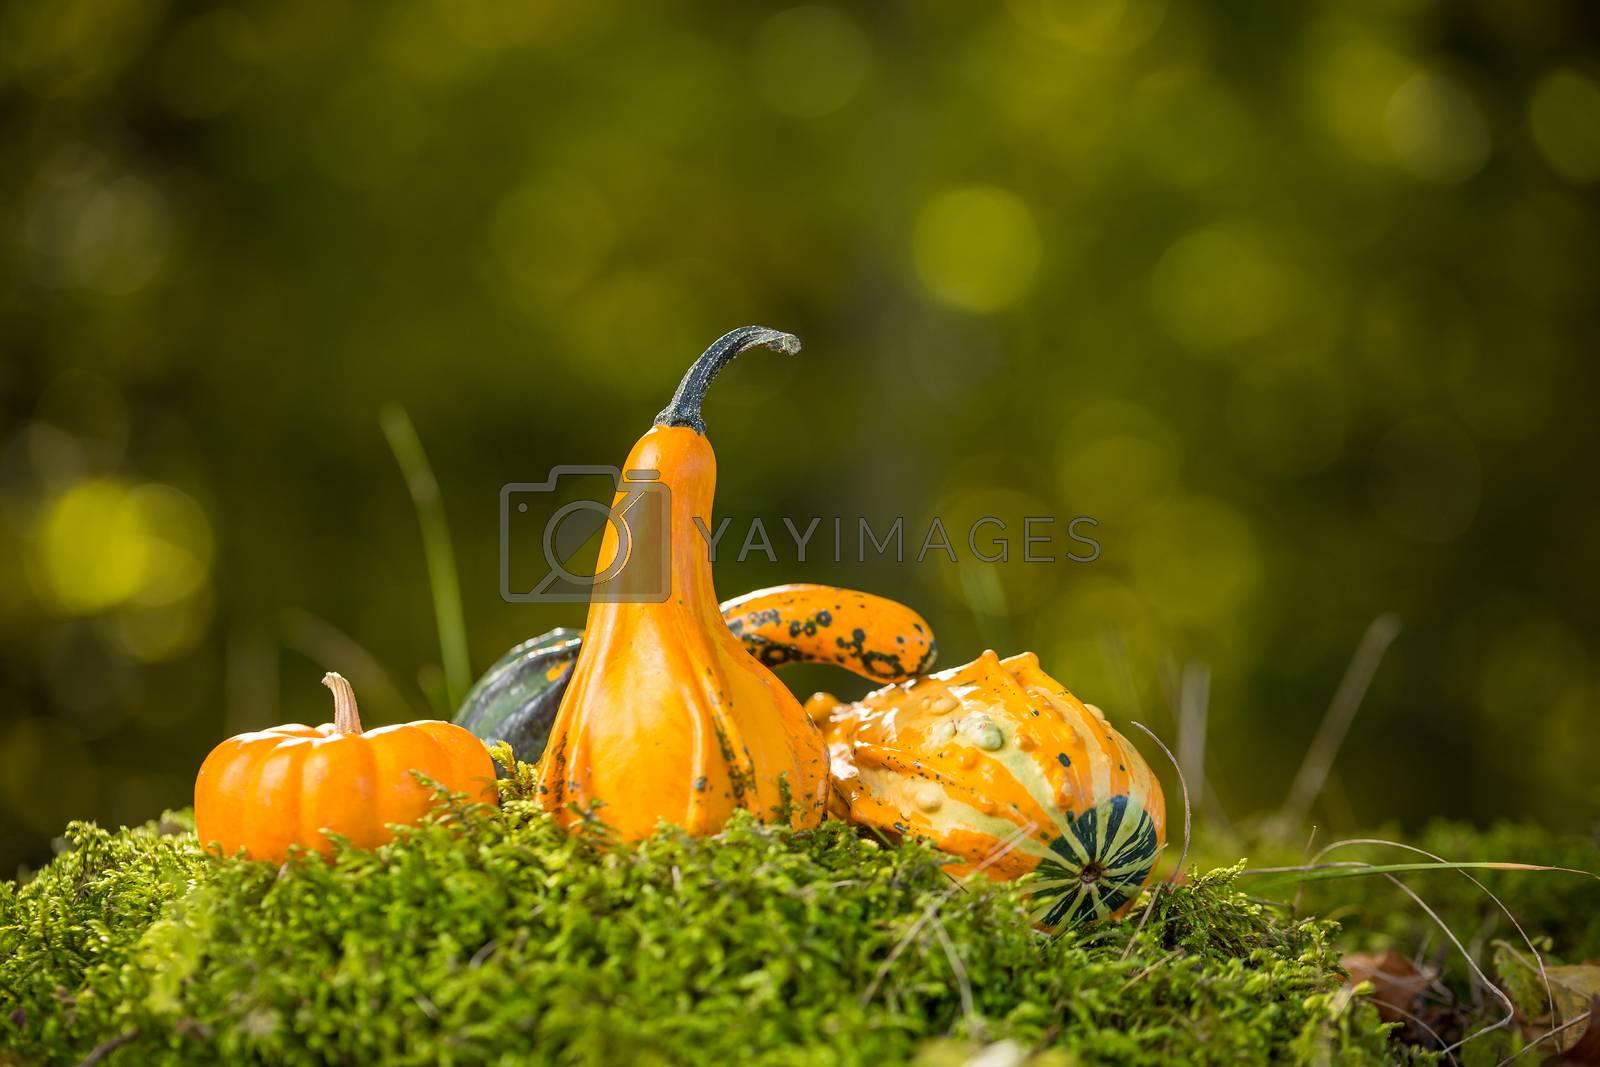 Autumn decor, pumpkins arranged in a pleasing fall outdoor display